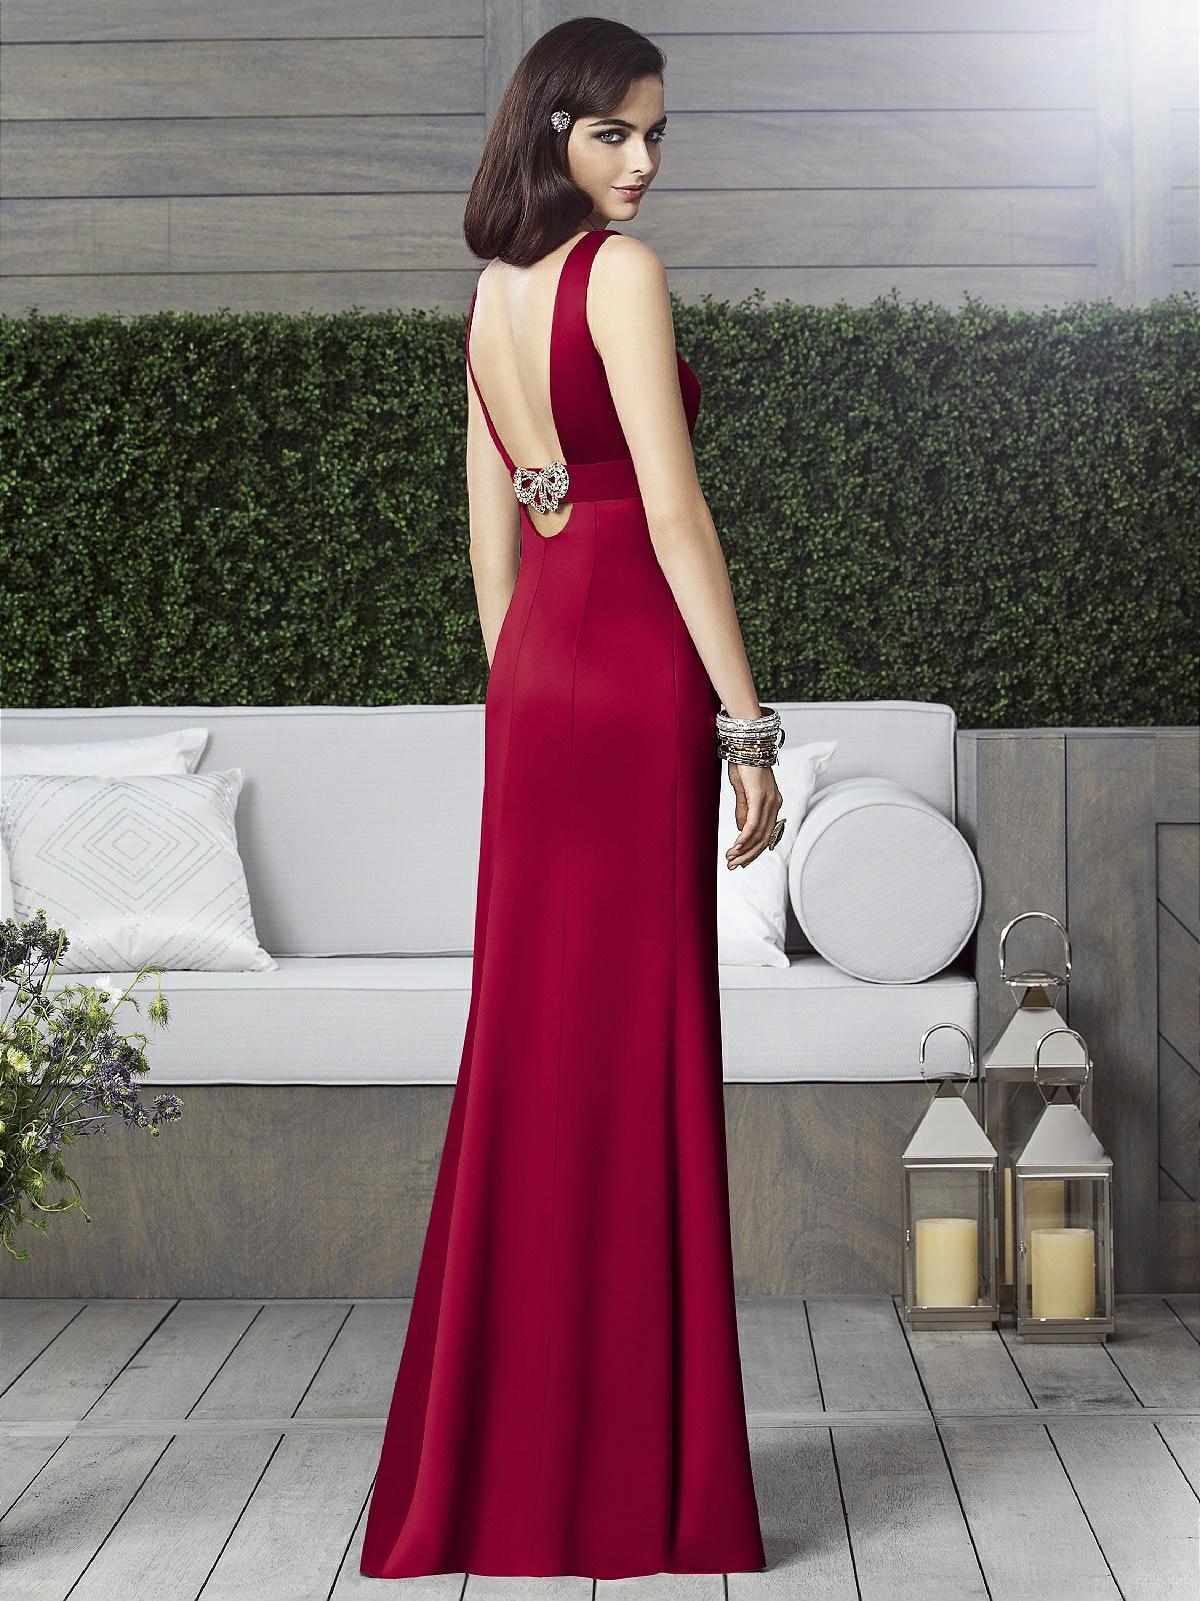 satin claret bridesmaid dress